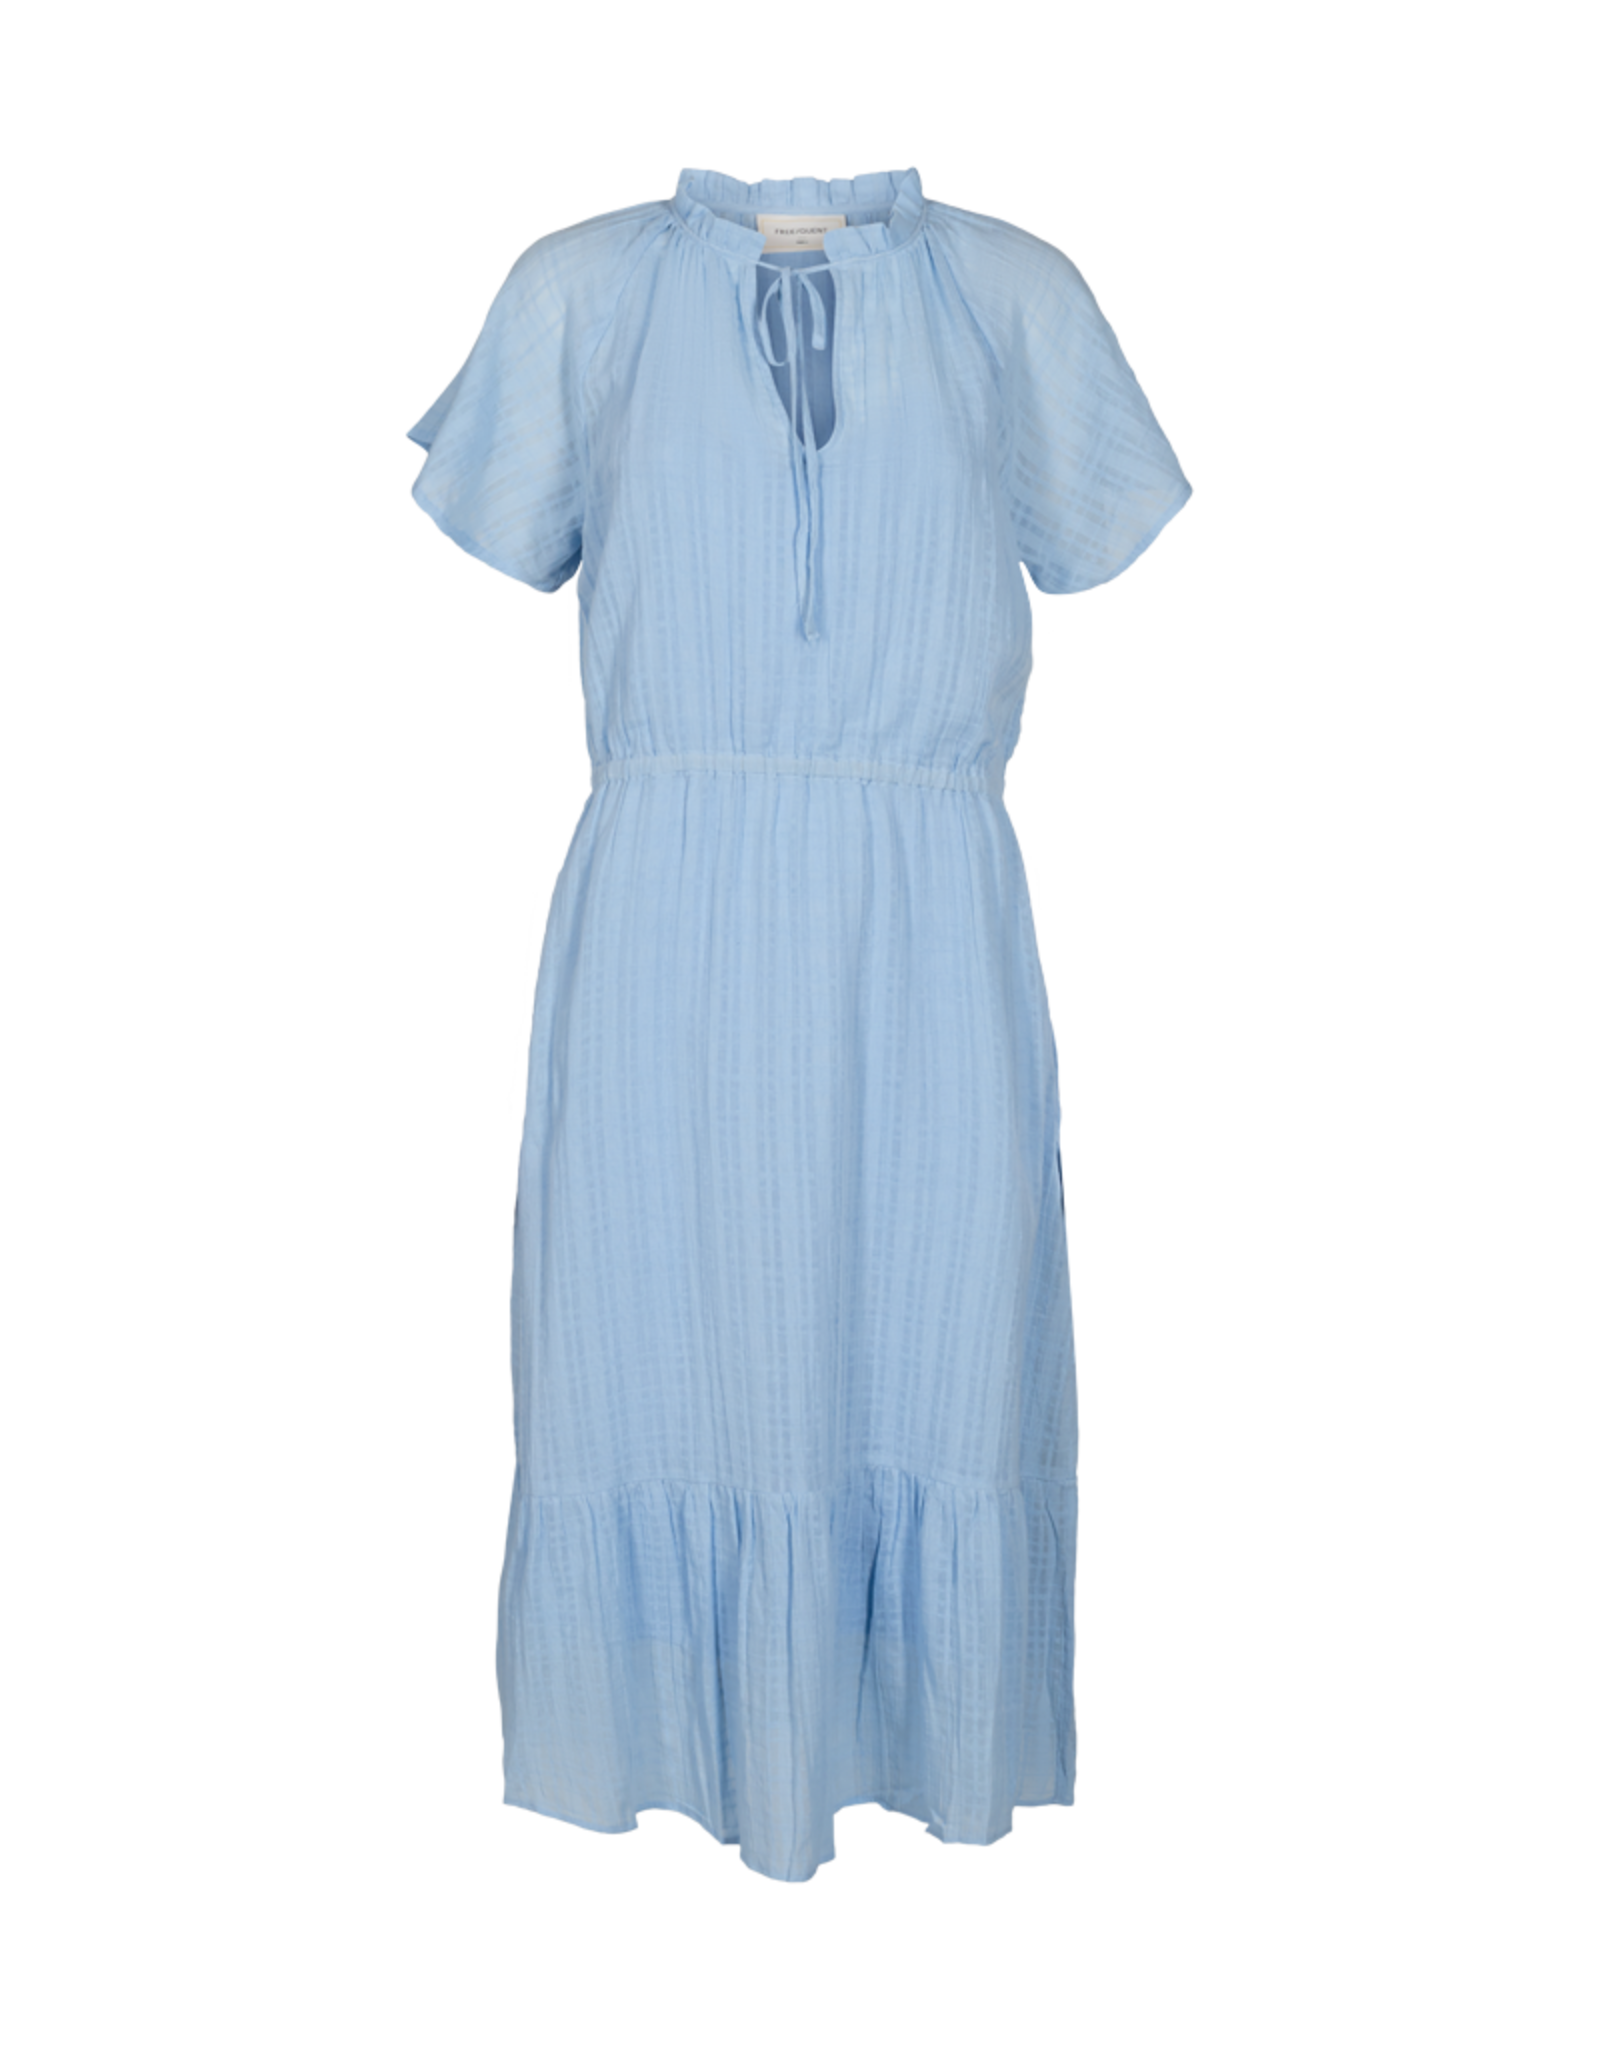 ZABA DRESS BLUE